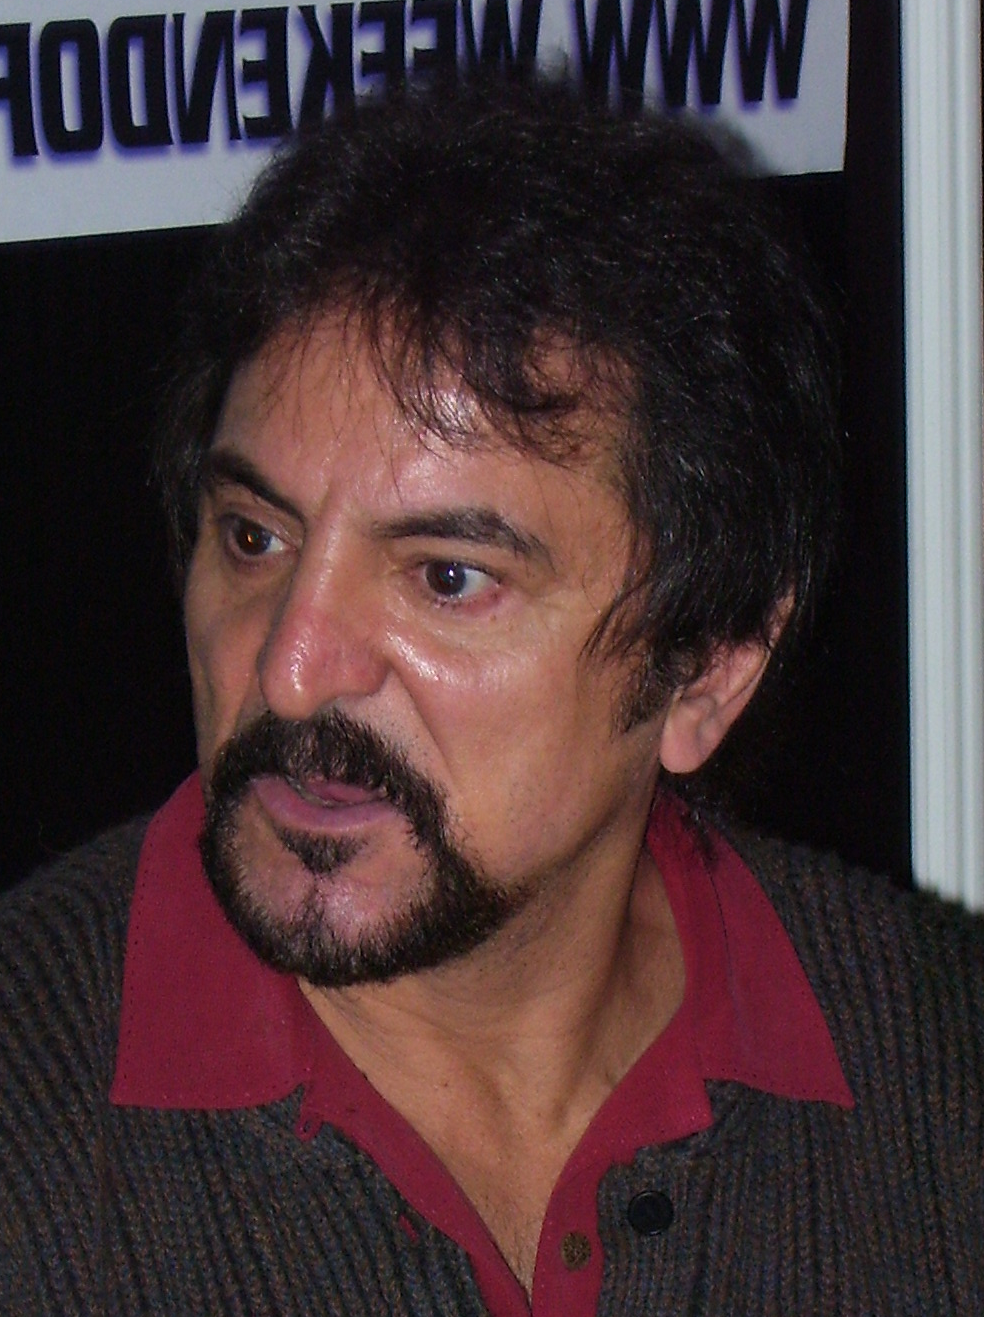 Image of Tom Savini from Wikidata